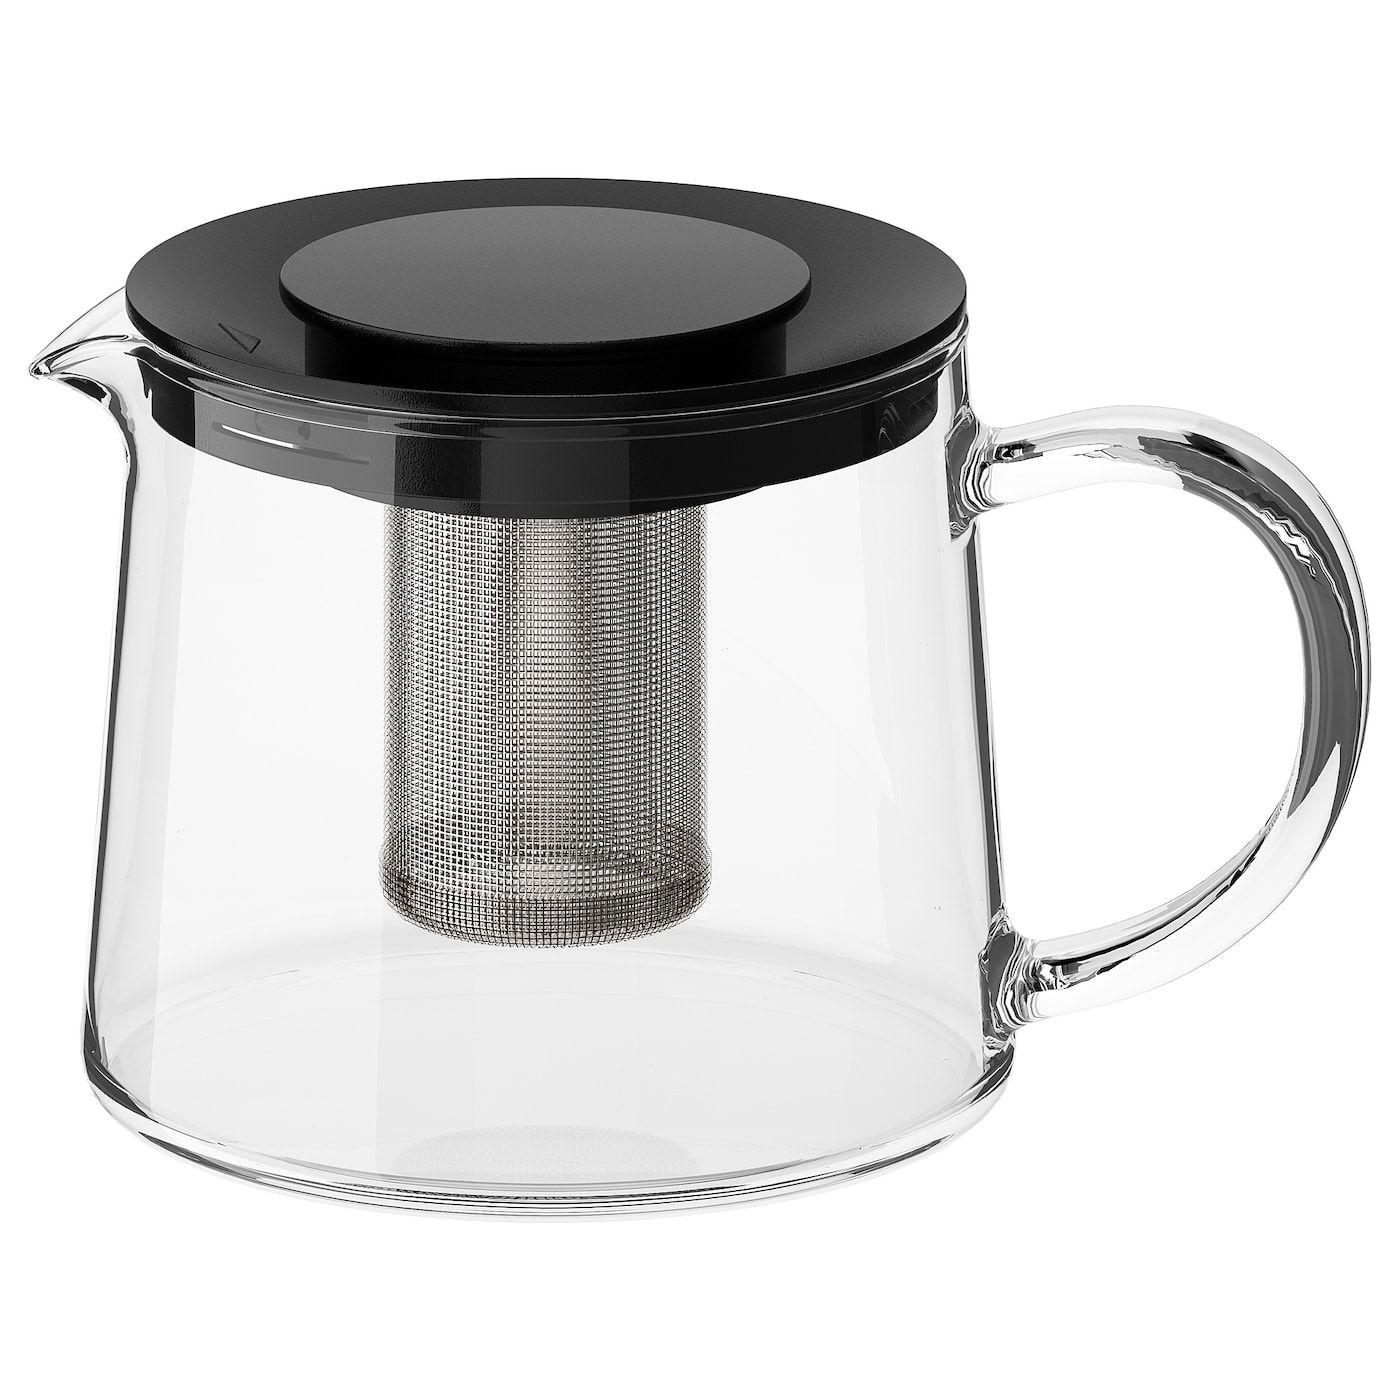 Riklig Glass Teapot Height 10 Cm Ikea Theepot Glas Ikea